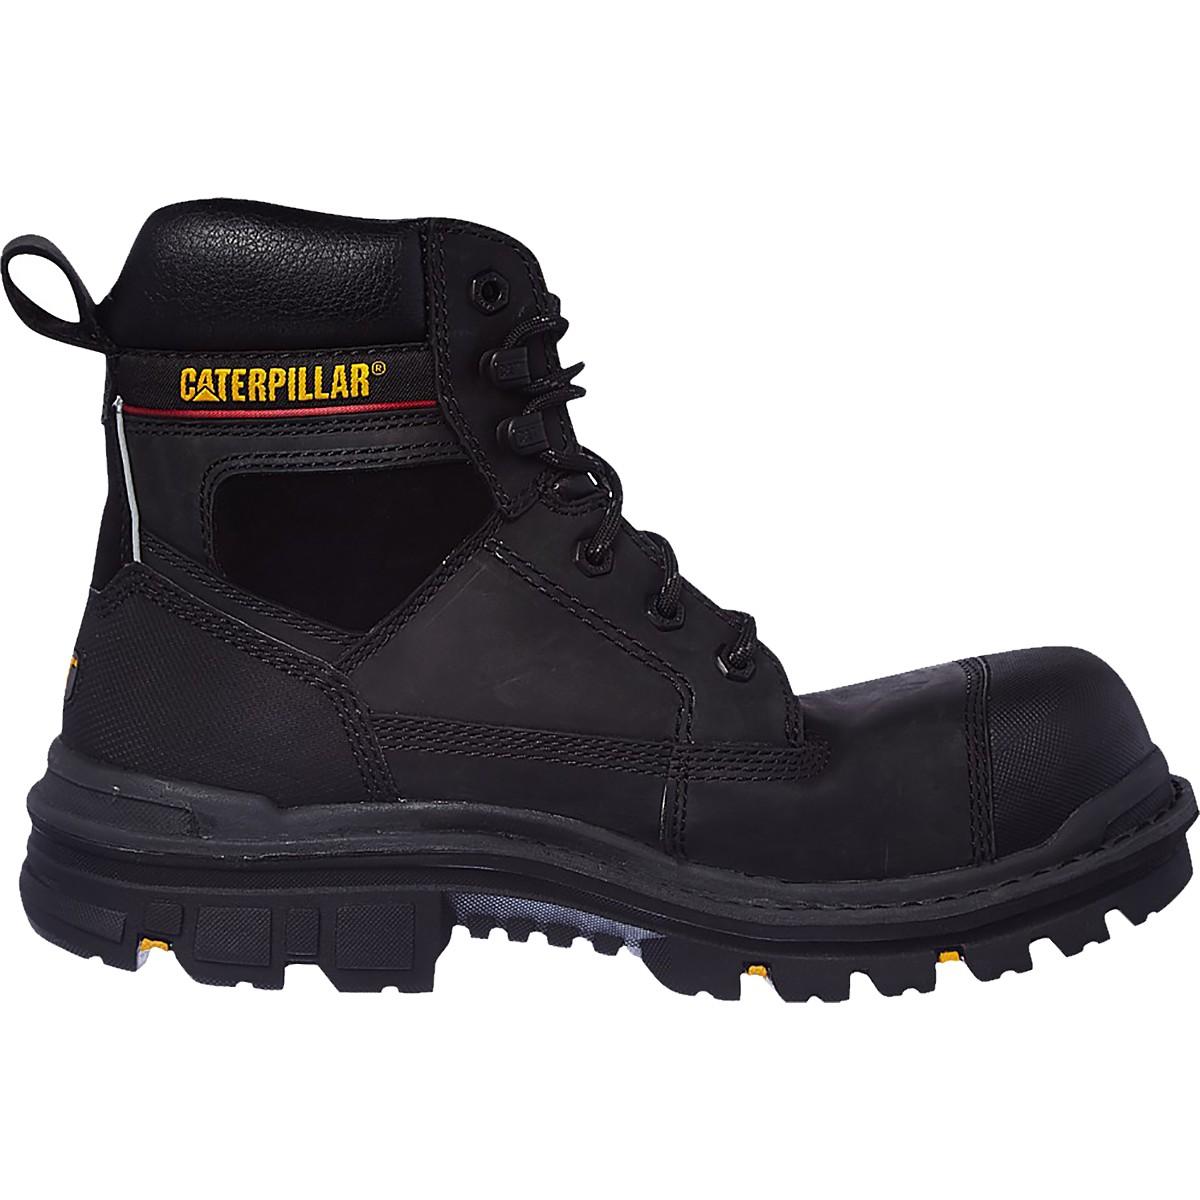 Mens Caterpillar Gravel Steel TOE CAP Safety Boots CAT Heavy Duty Work Boot | EBay